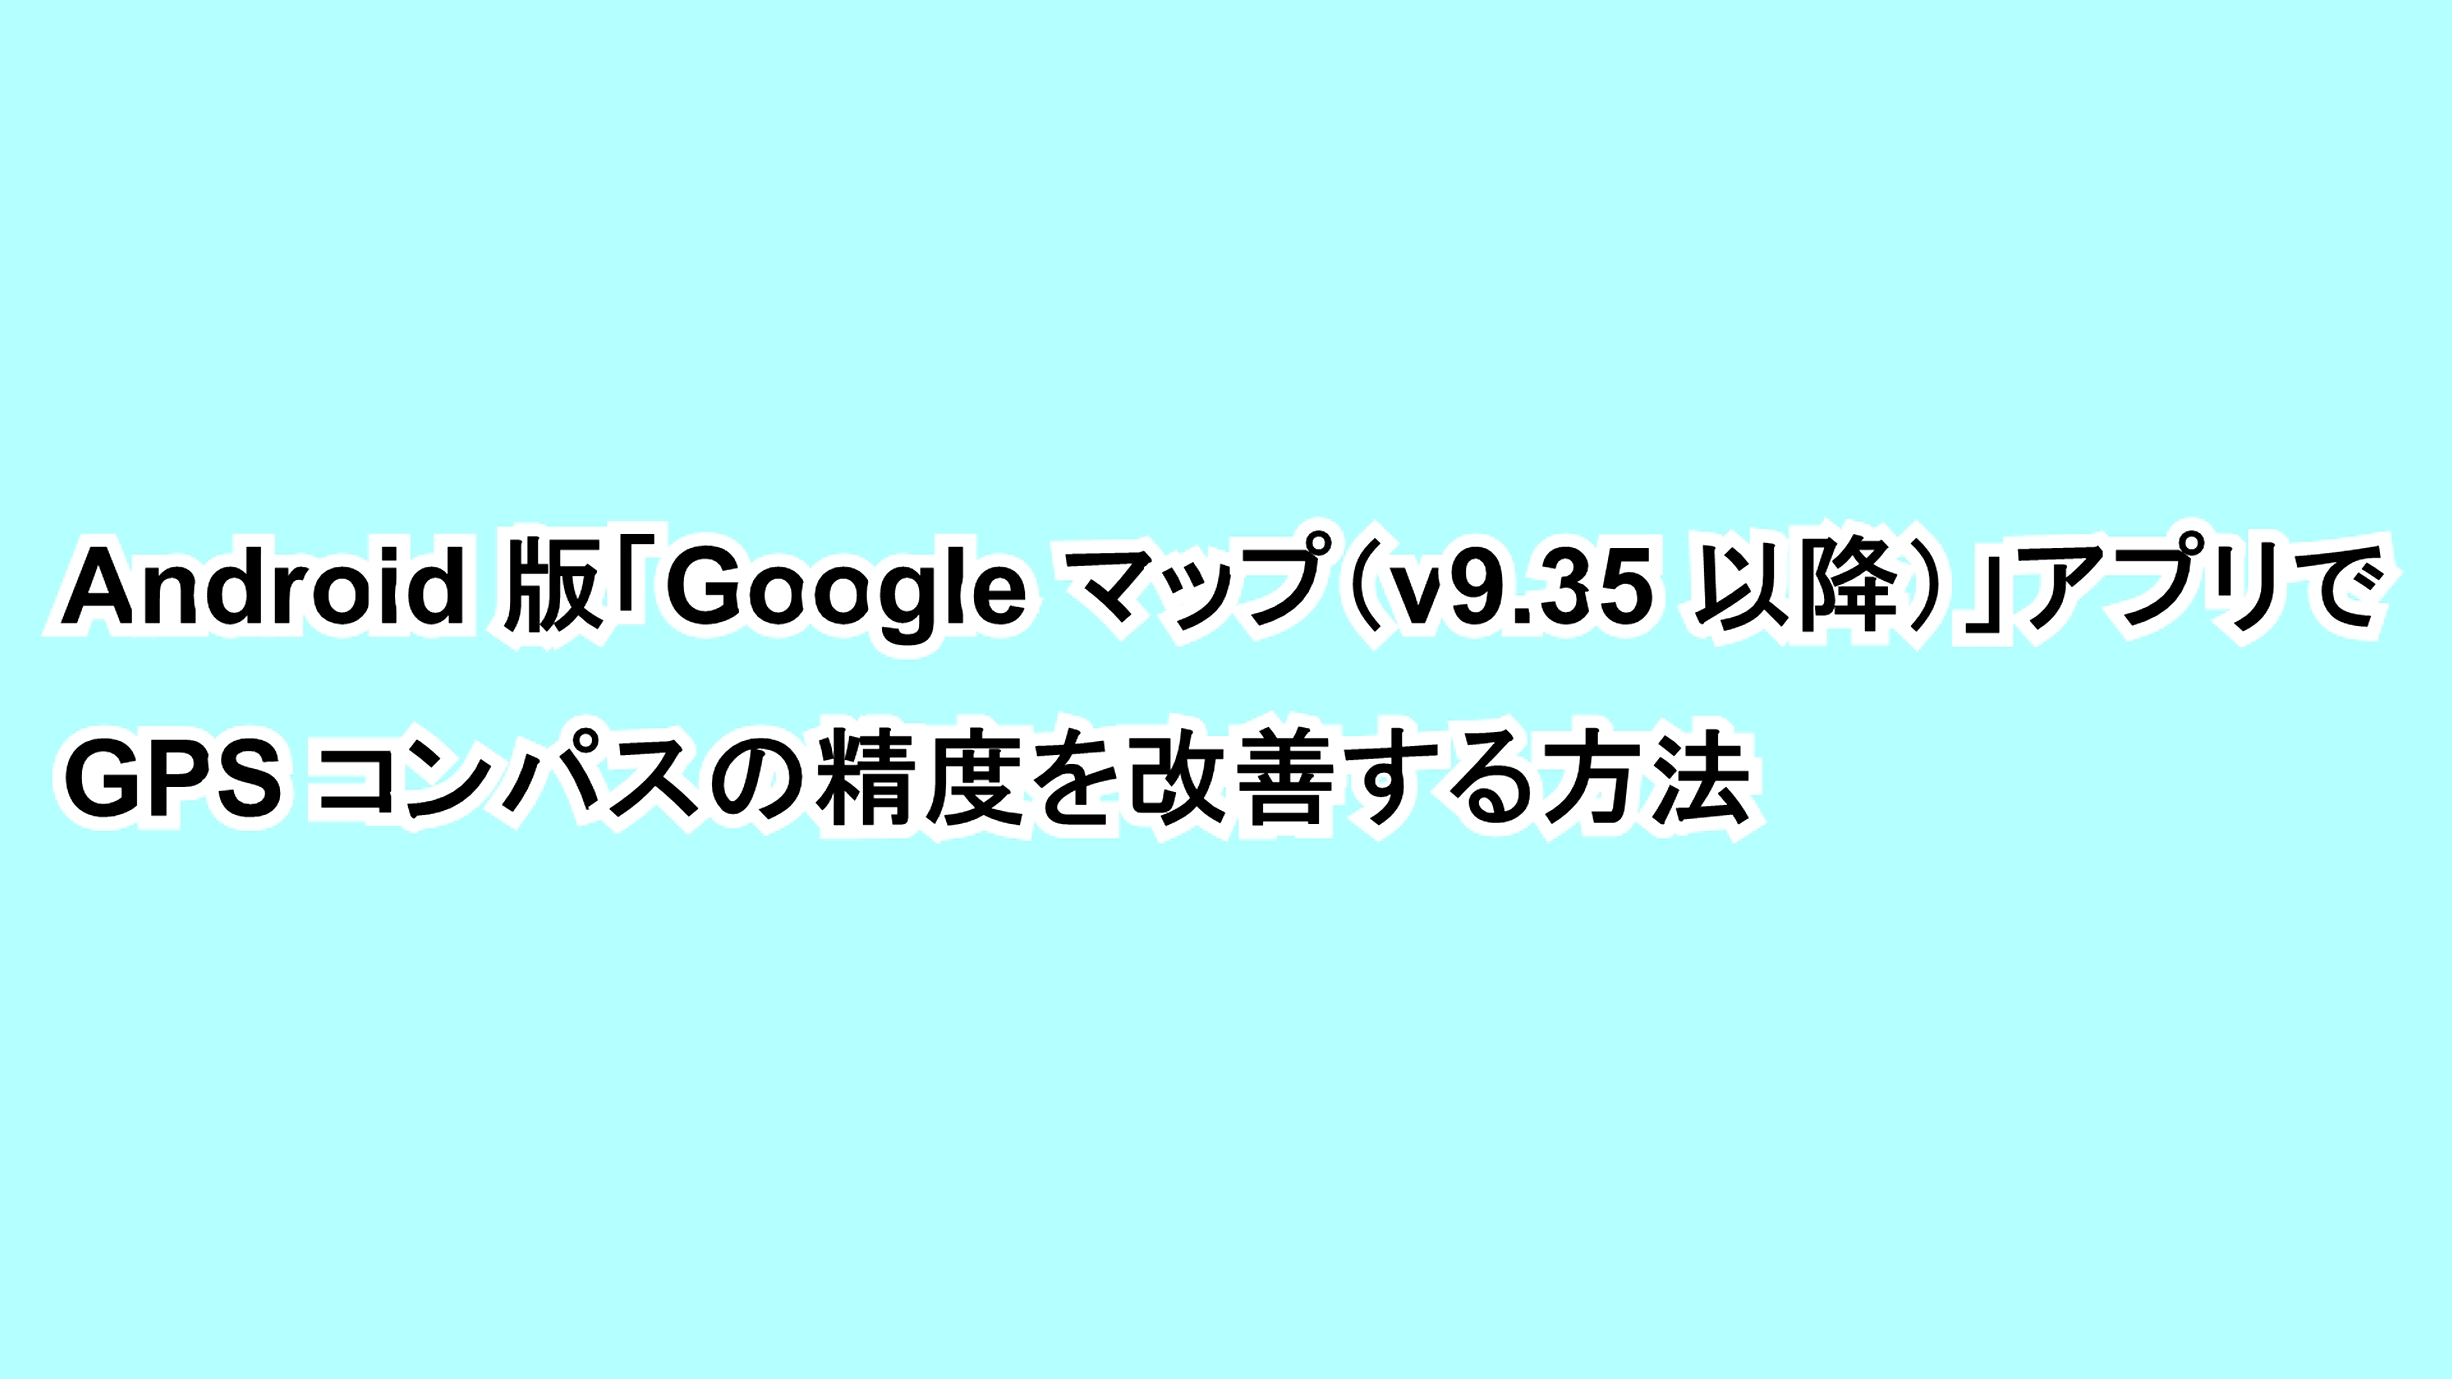 Android版「Google マップ(v9.35以降)」アプリでGPSコンパスの精度を改善する方法